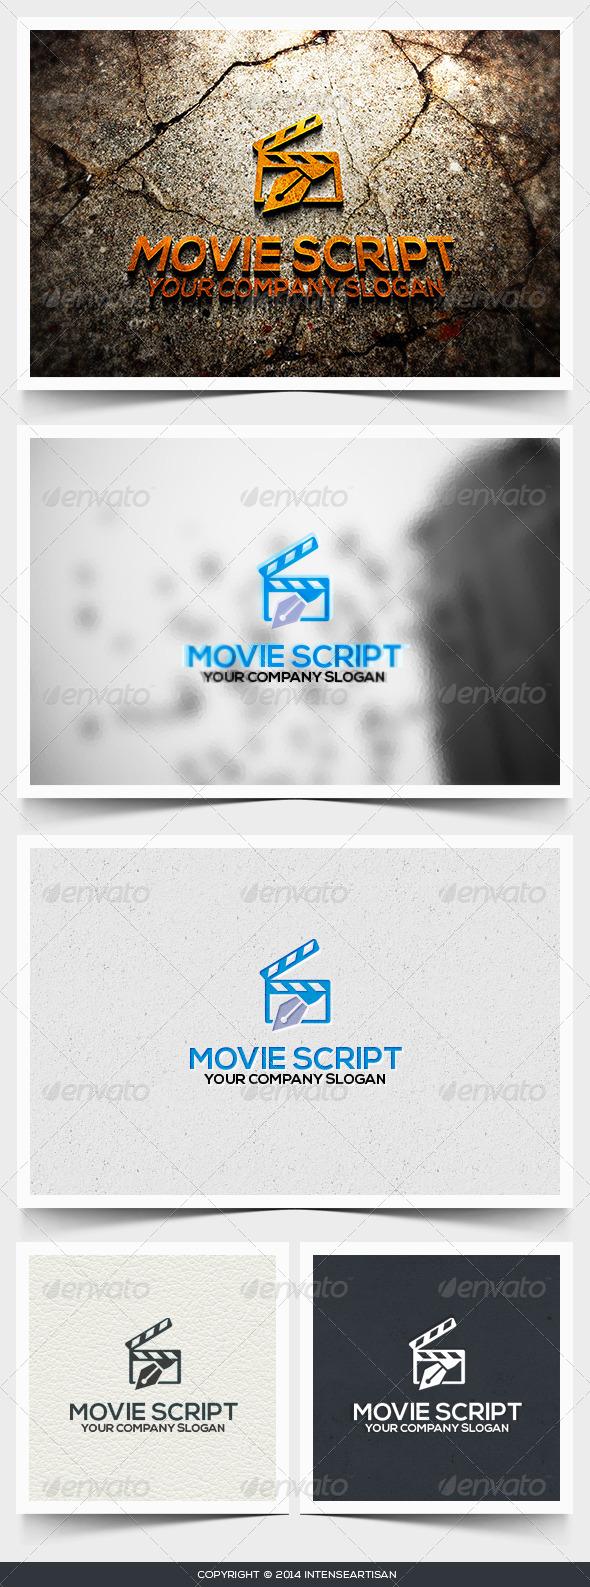 Movie Script Logo Template